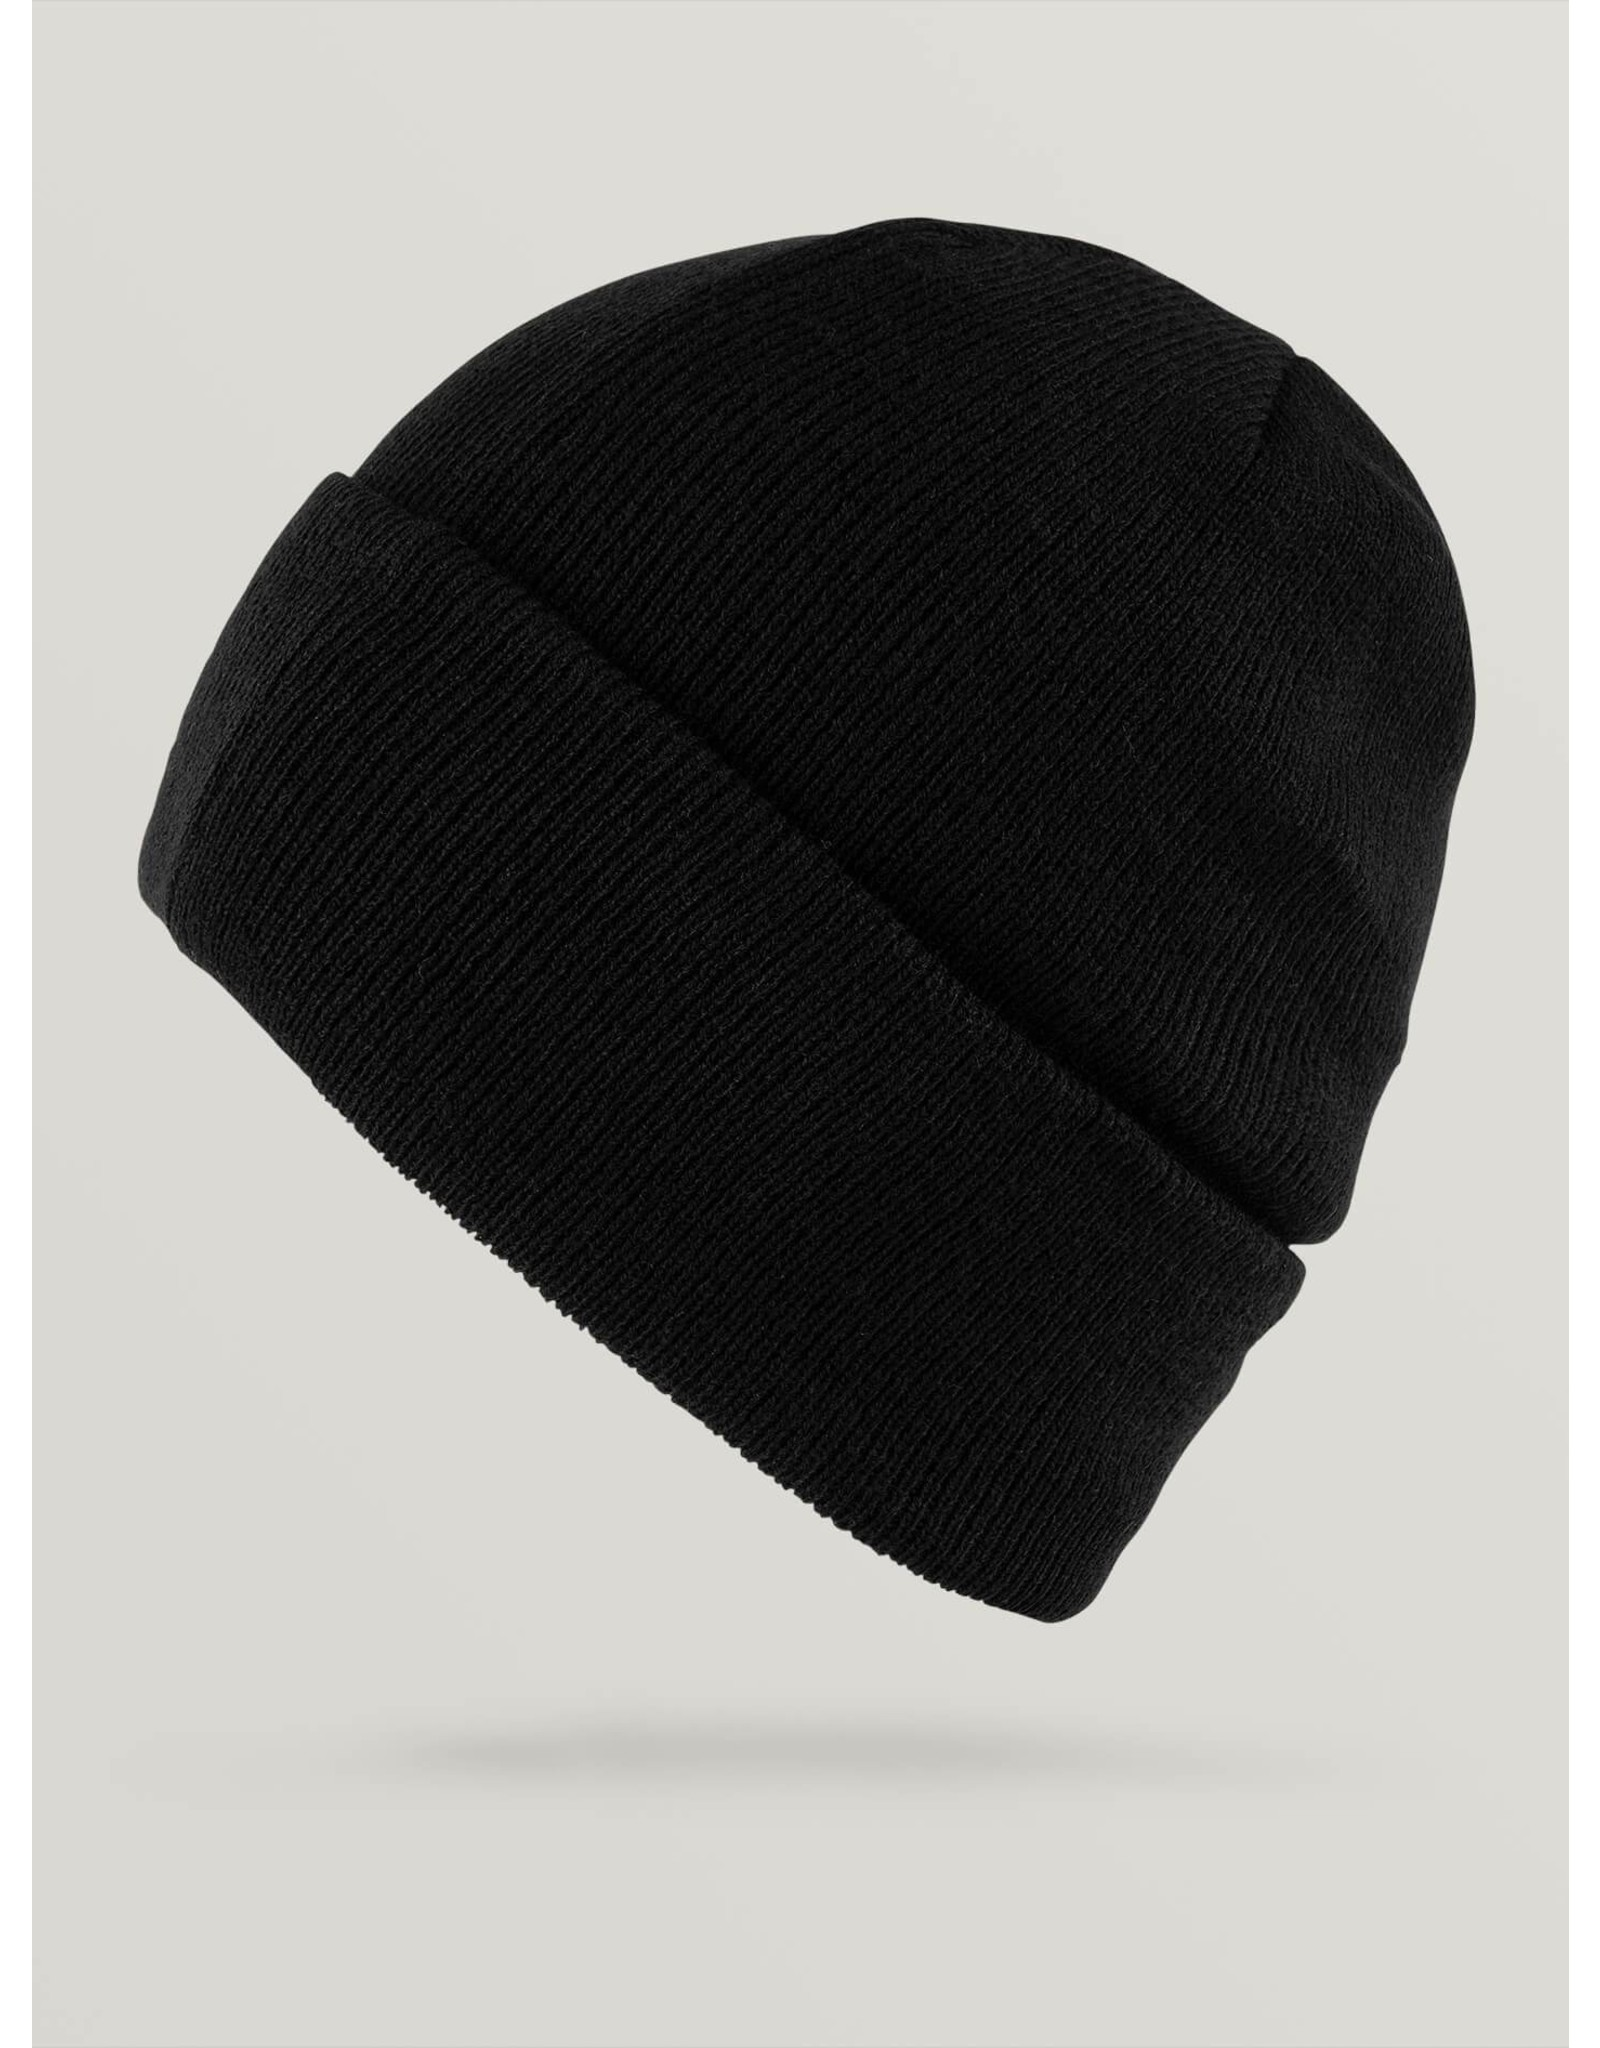 Volcom Box Stone Beanie - Black